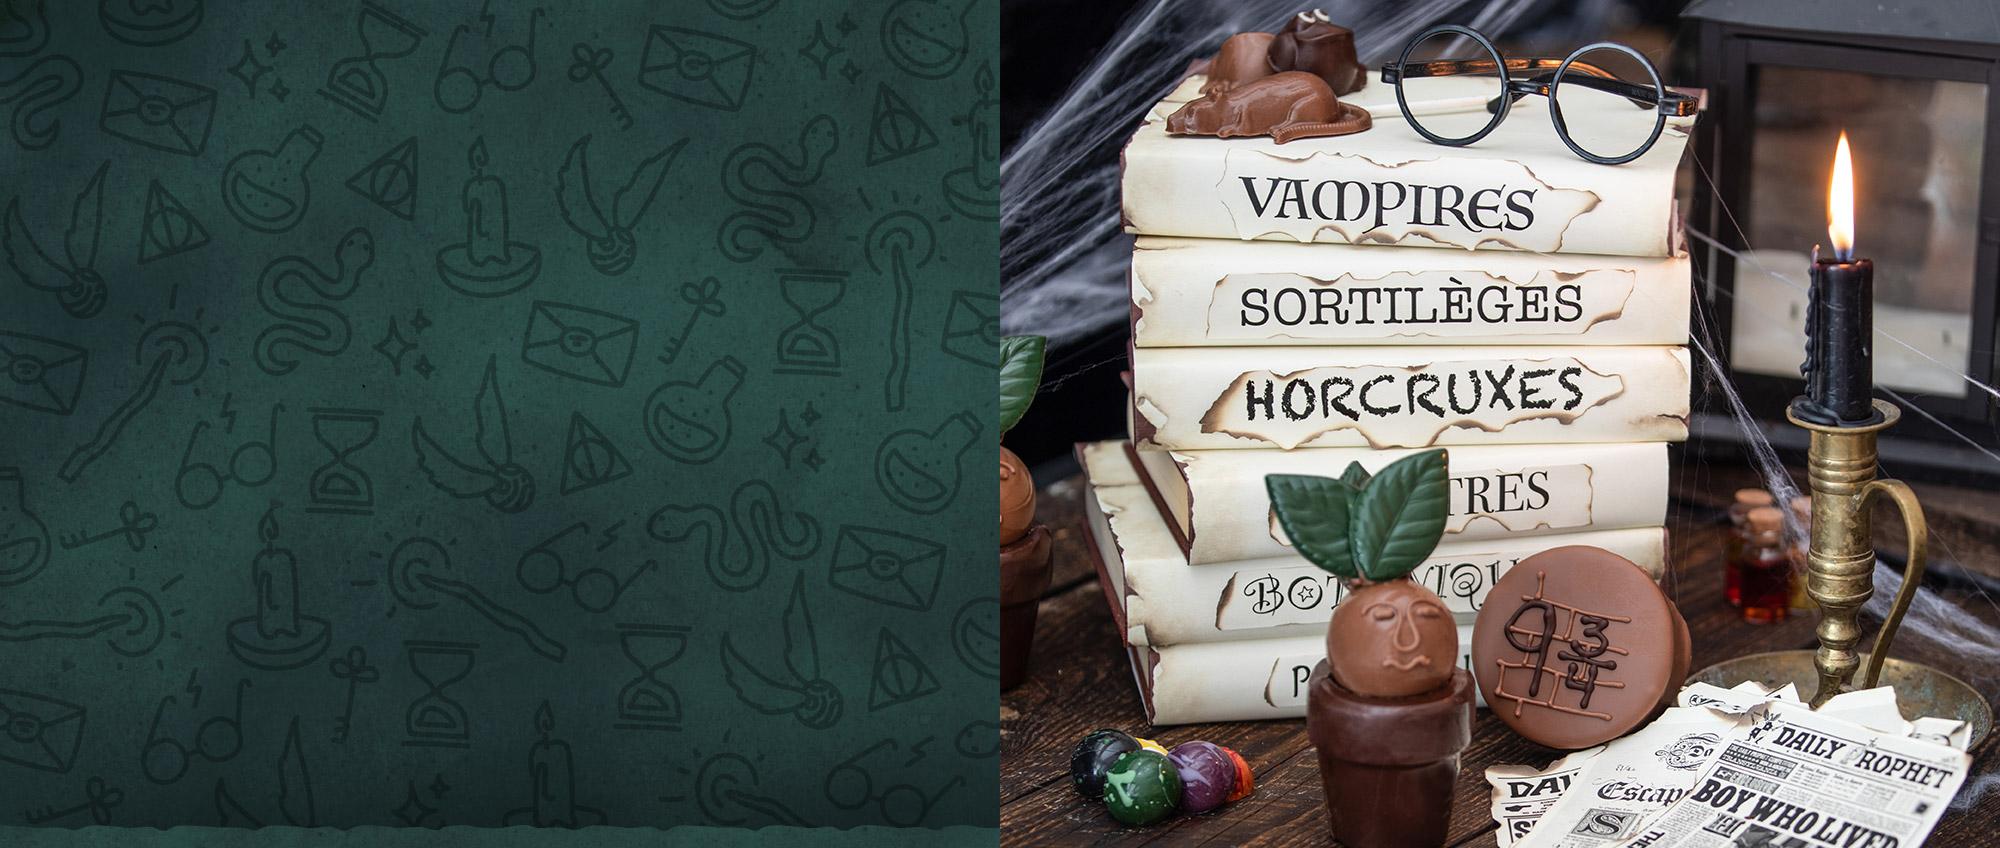 ChocoChocolat_Slider-HarryPotter_2000x848